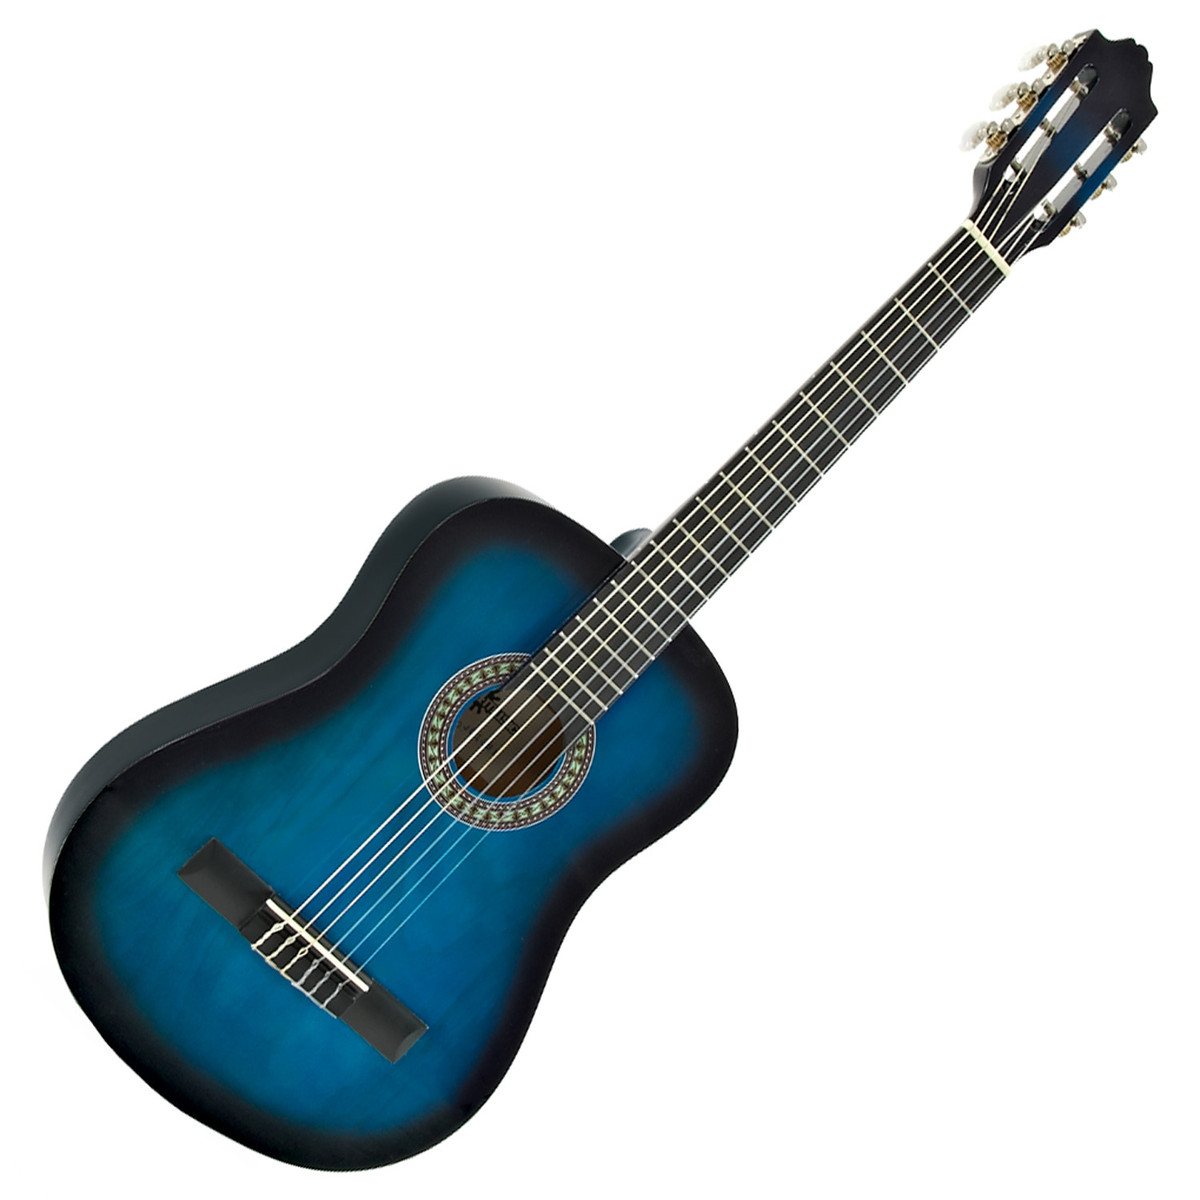 guitare classique junior deluxe bleu par gear4music ex. Black Bedroom Furniture Sets. Home Design Ideas